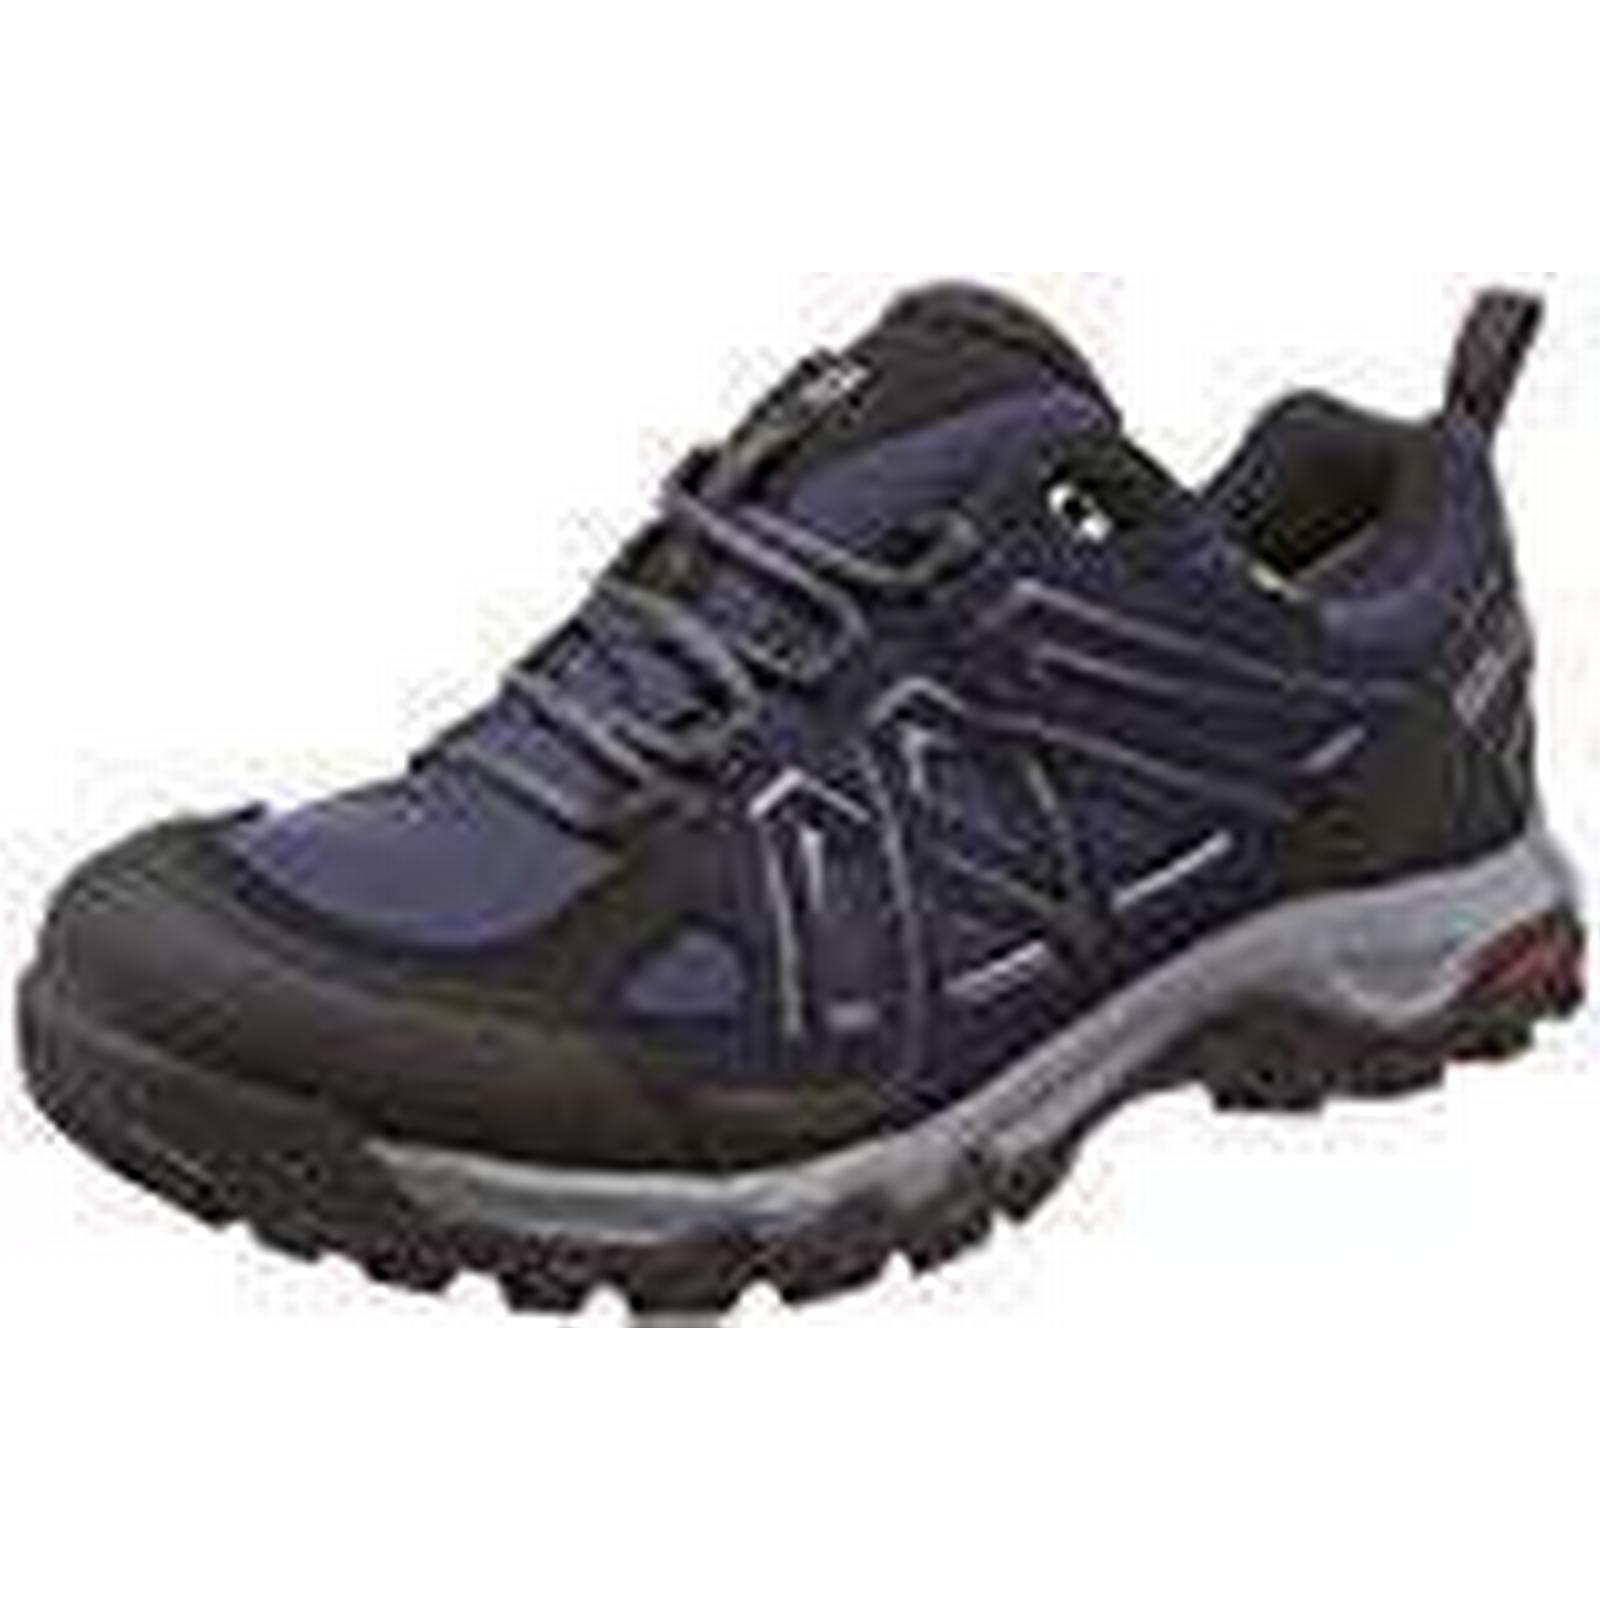 Salomon Men's Evasion 2 GTX Hiking and Multifunction Shoe, (Graphite/Night 44 Sky/Quiet Shade), 9.5 UK 44 (Graphite/Night EU 57d53c